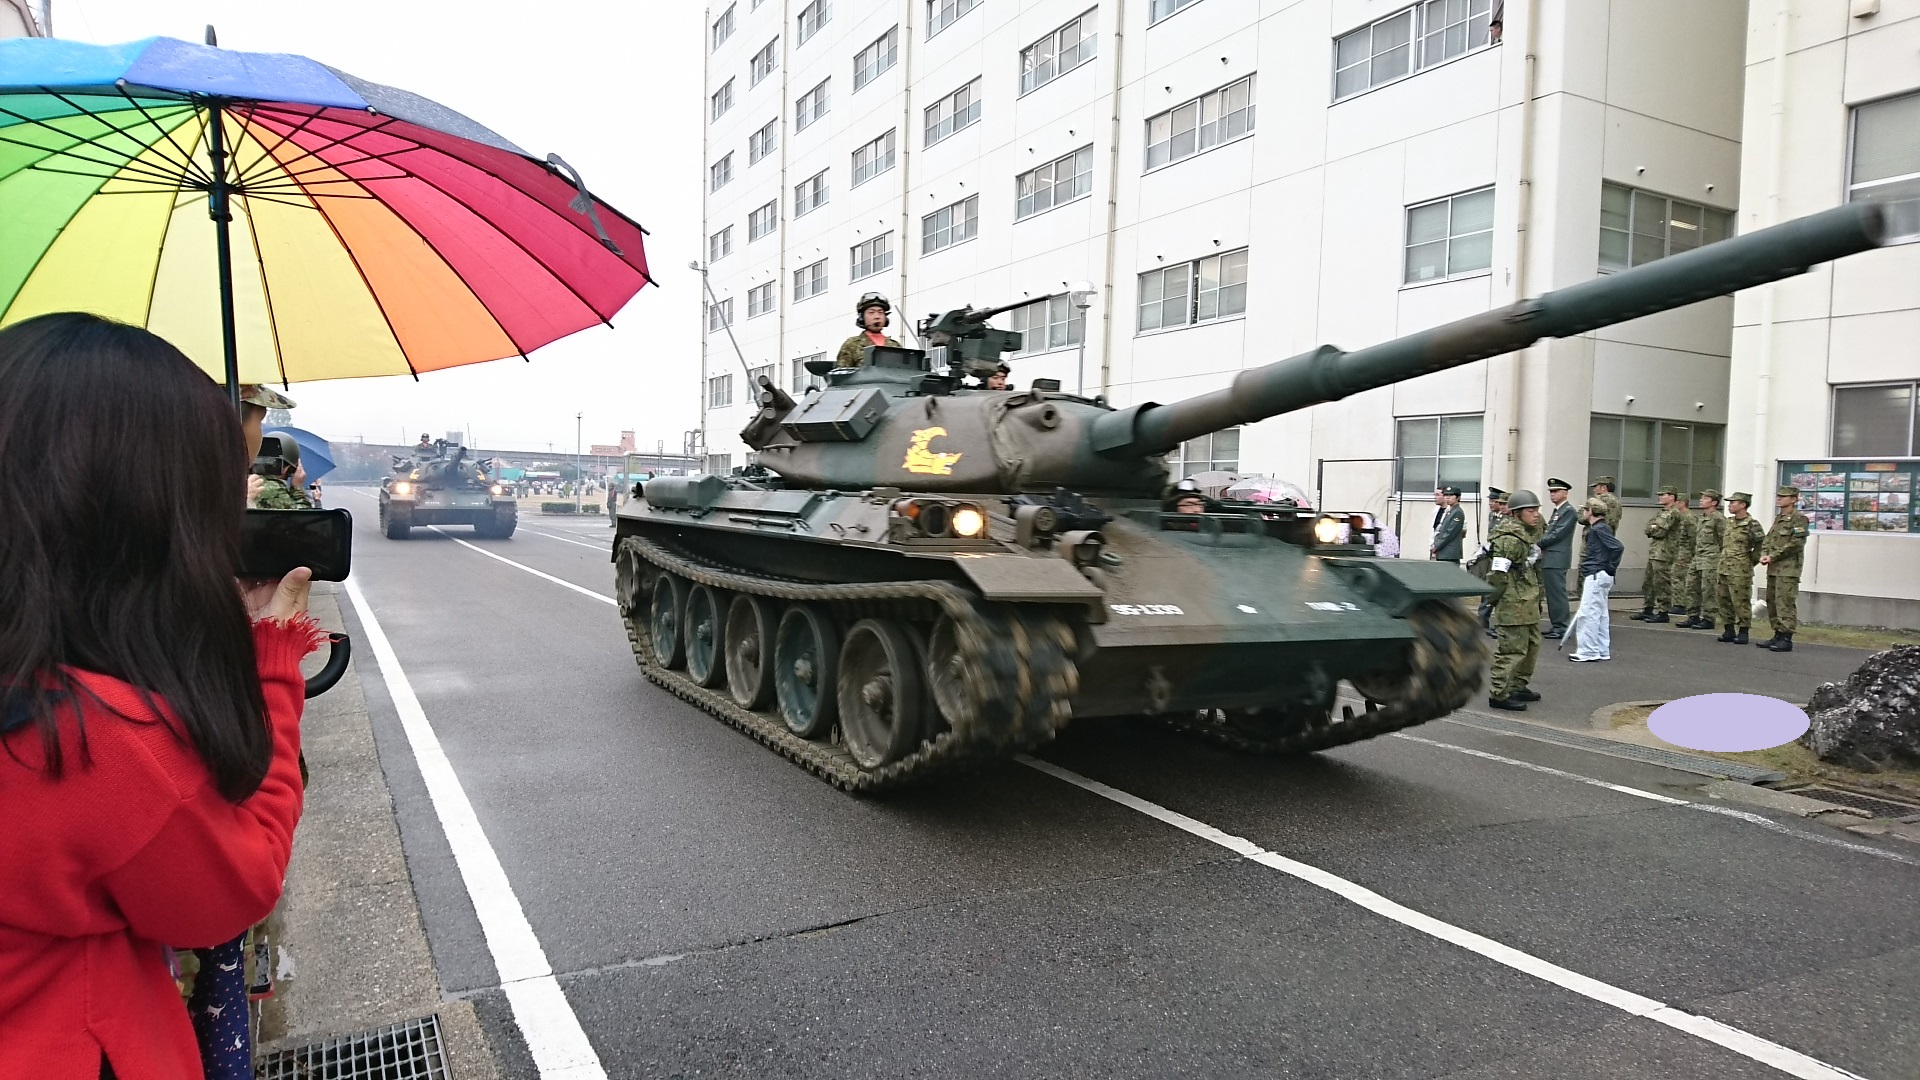 2017.10.28 守山駐屯地 (32) 74式戦車の行進 1920-1080